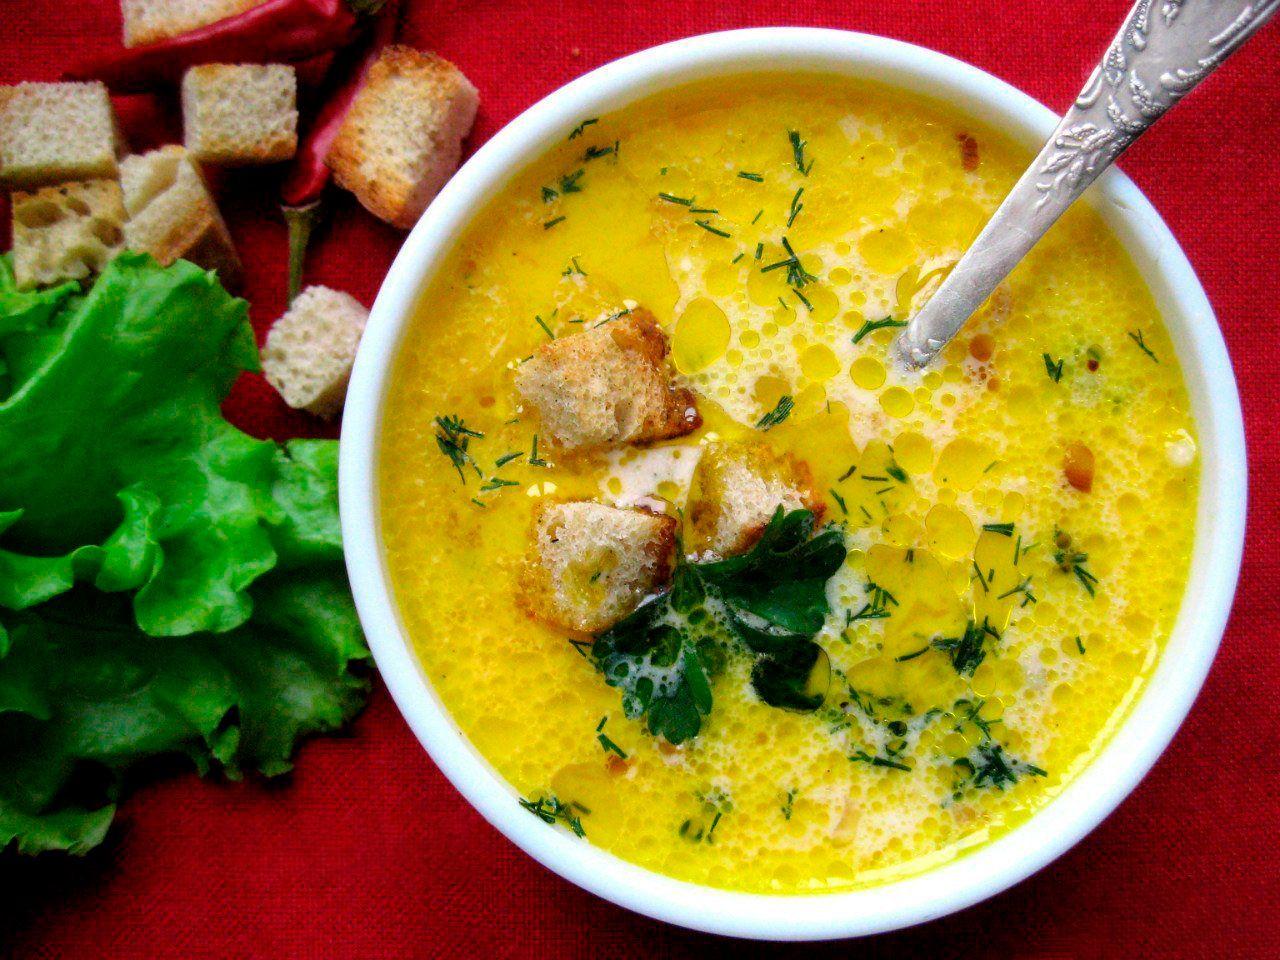 Рецепт овощного супа для питания при панкреатите и холецистите